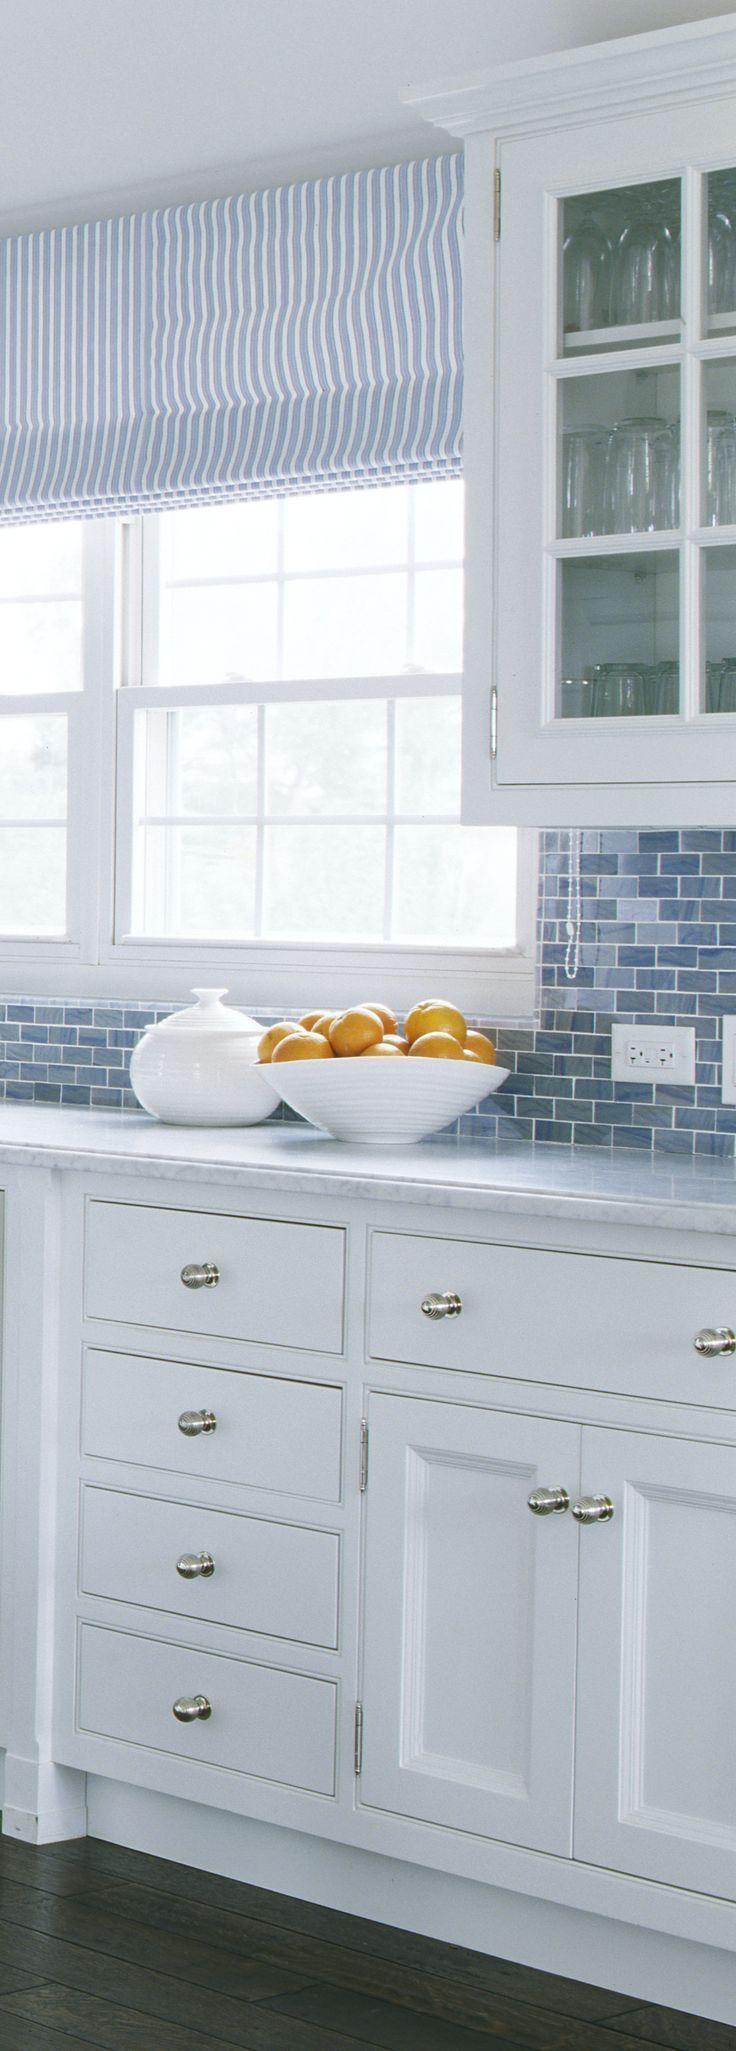 1106 best Kitchen images on Pinterest | Organization ideas ...